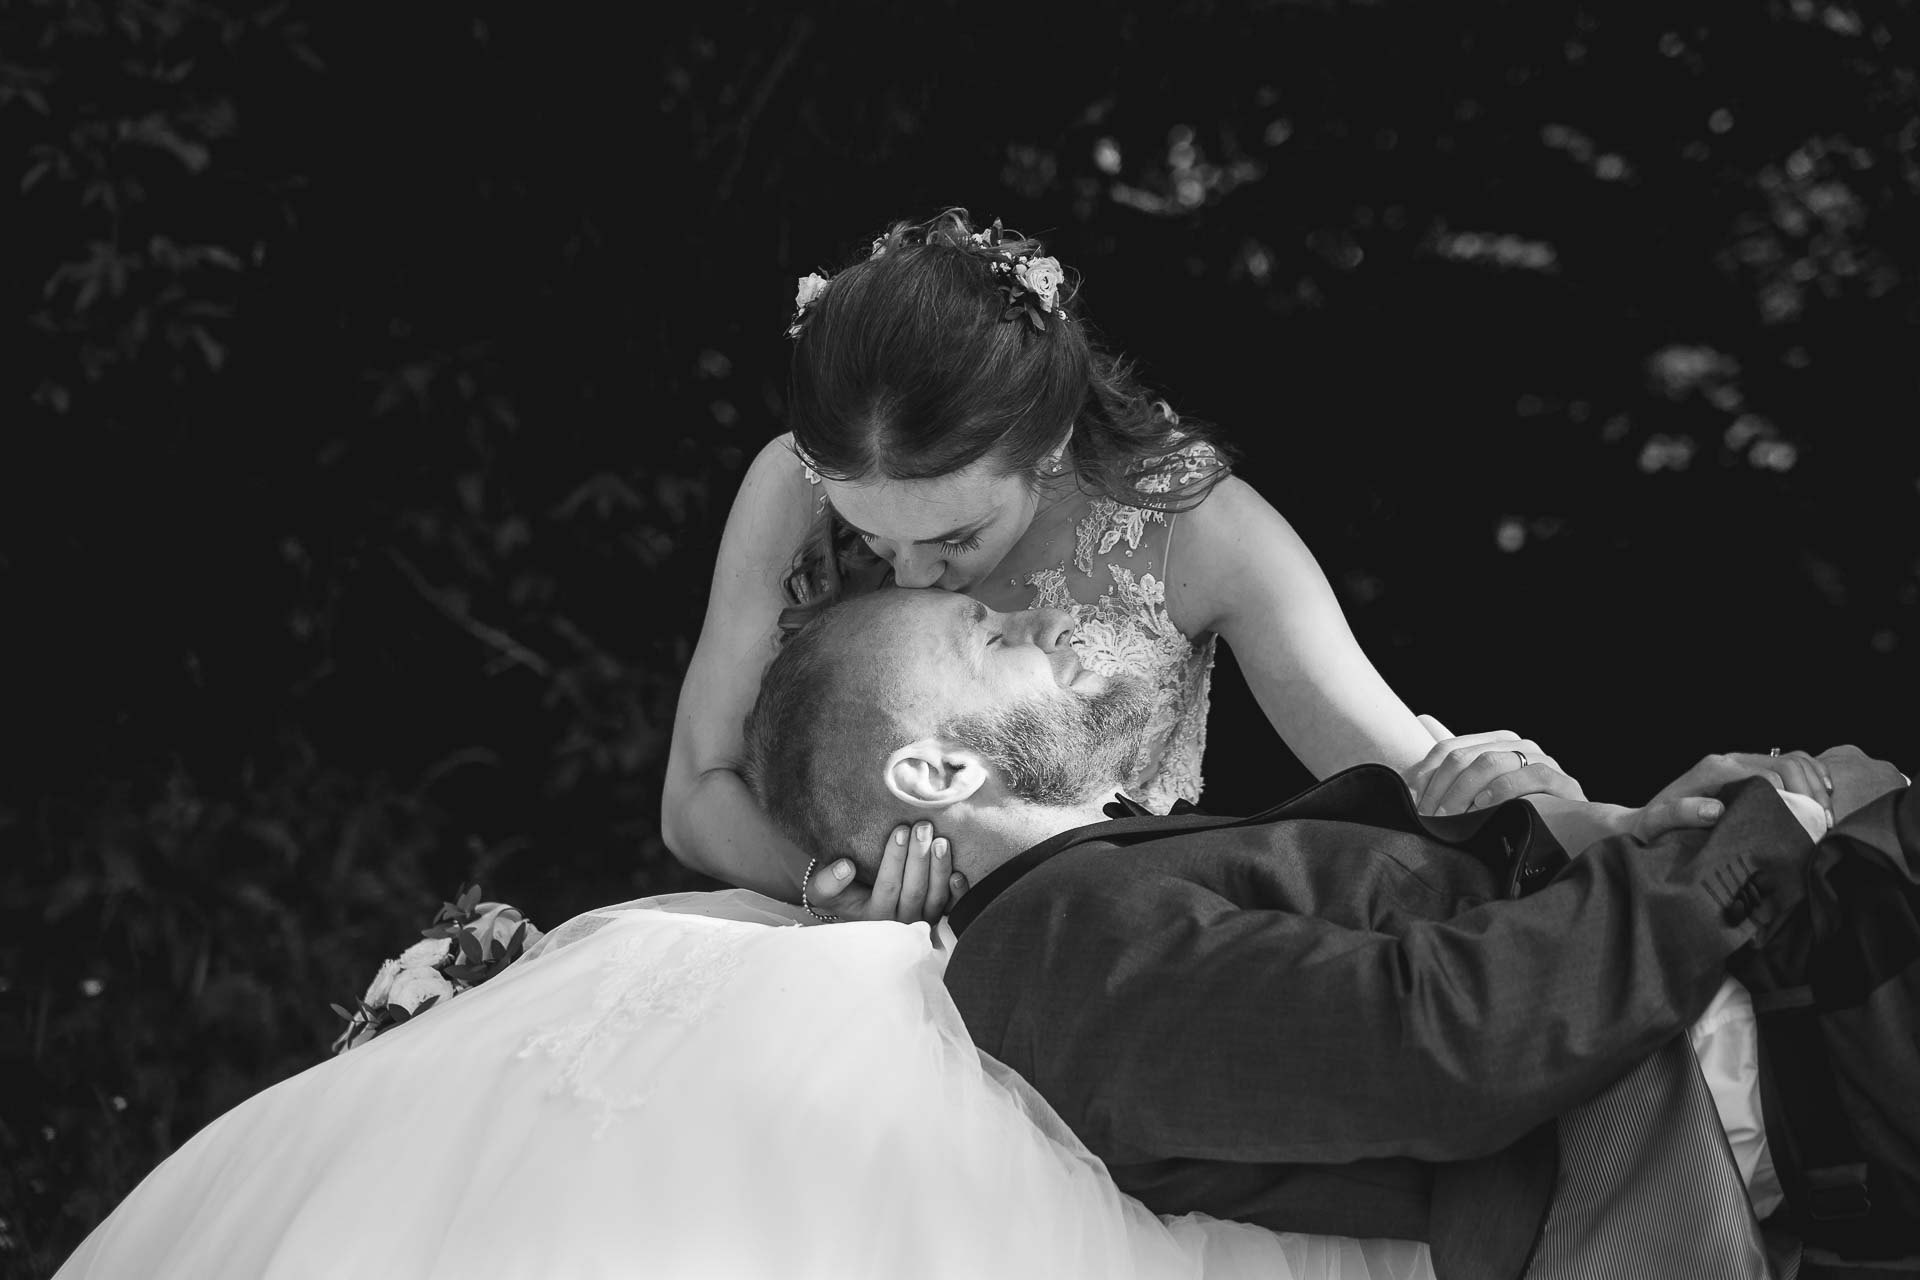 svatební-fotograf-svatebni-video-Nymburk-hotel-Ostrov-Beautyfoto-6217